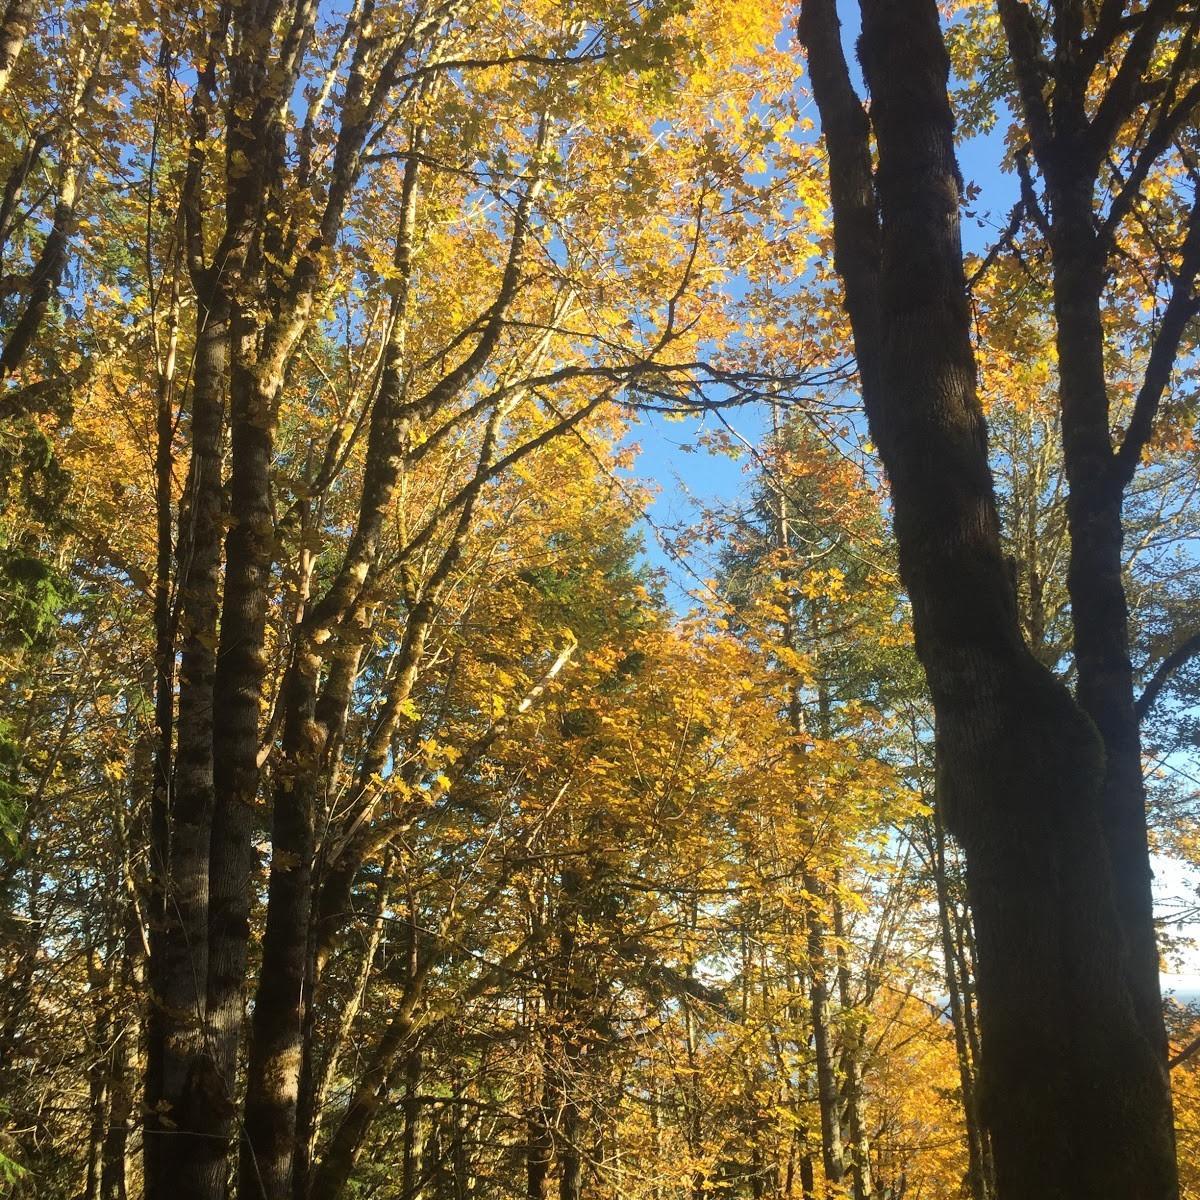 Bigleaf Maple at nature adventure Area at Alderbrook Woods